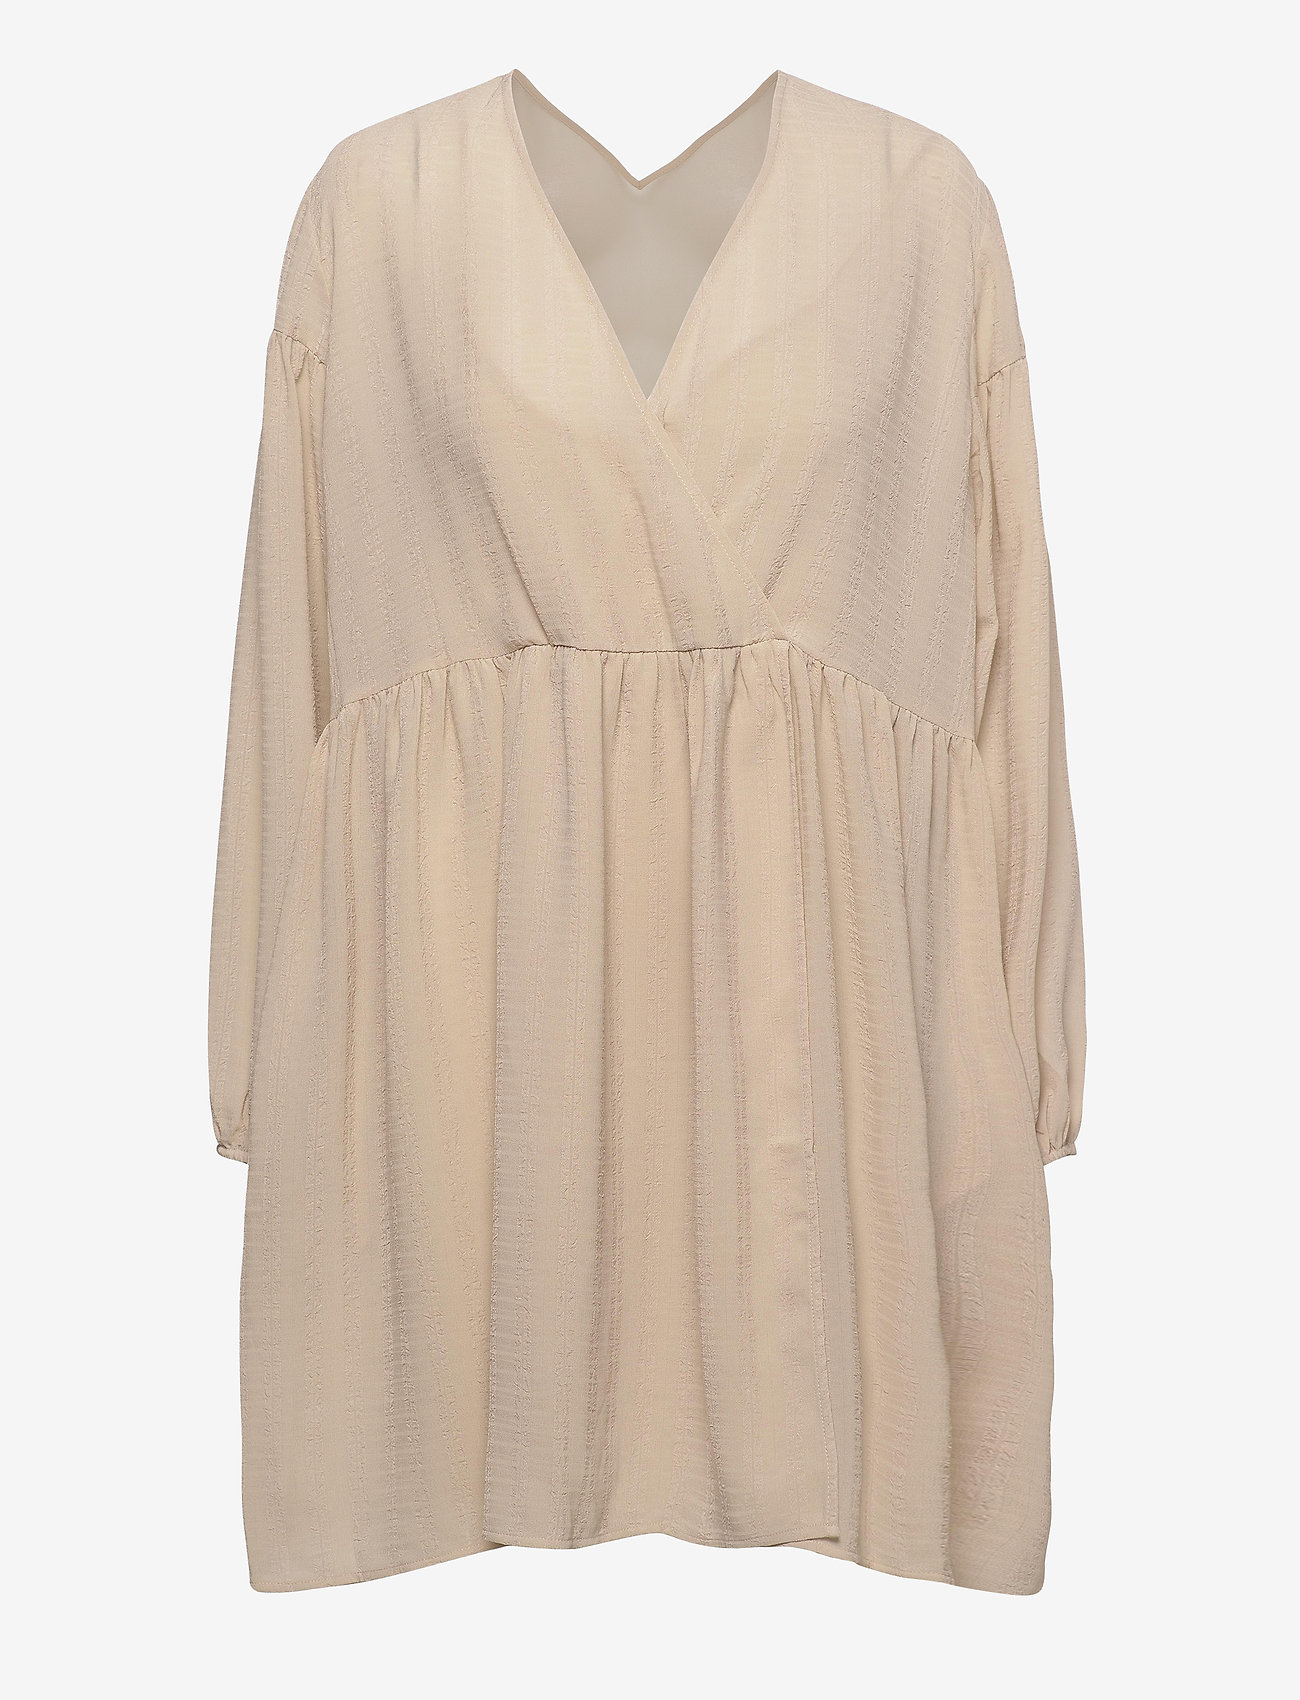 Samsøe Samsøe - Jolie short dress 12697 - summer dresses - quicksand - 0